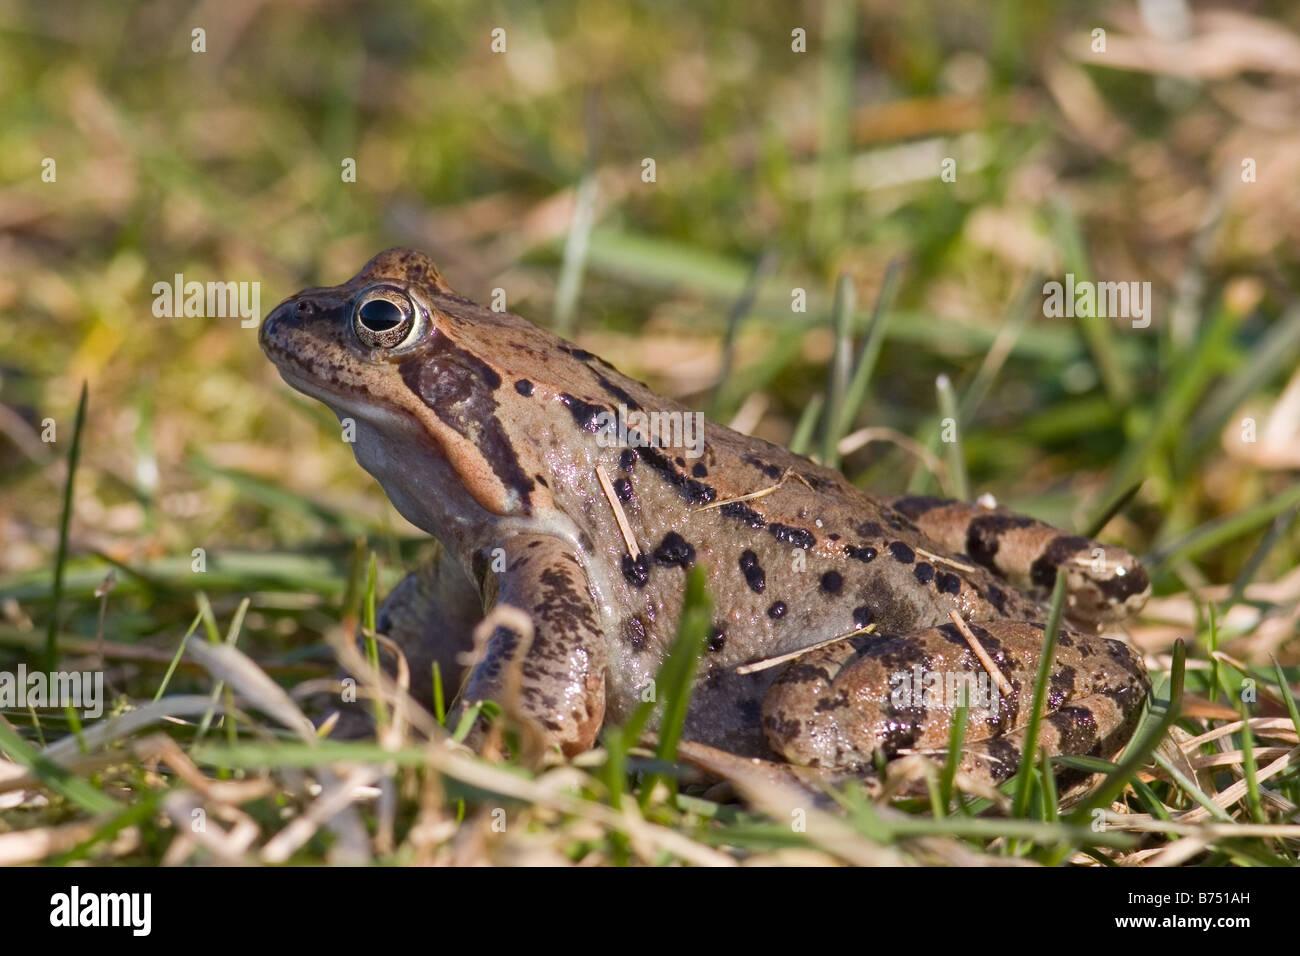 Common Frog, Rana temporaria - Stock Image